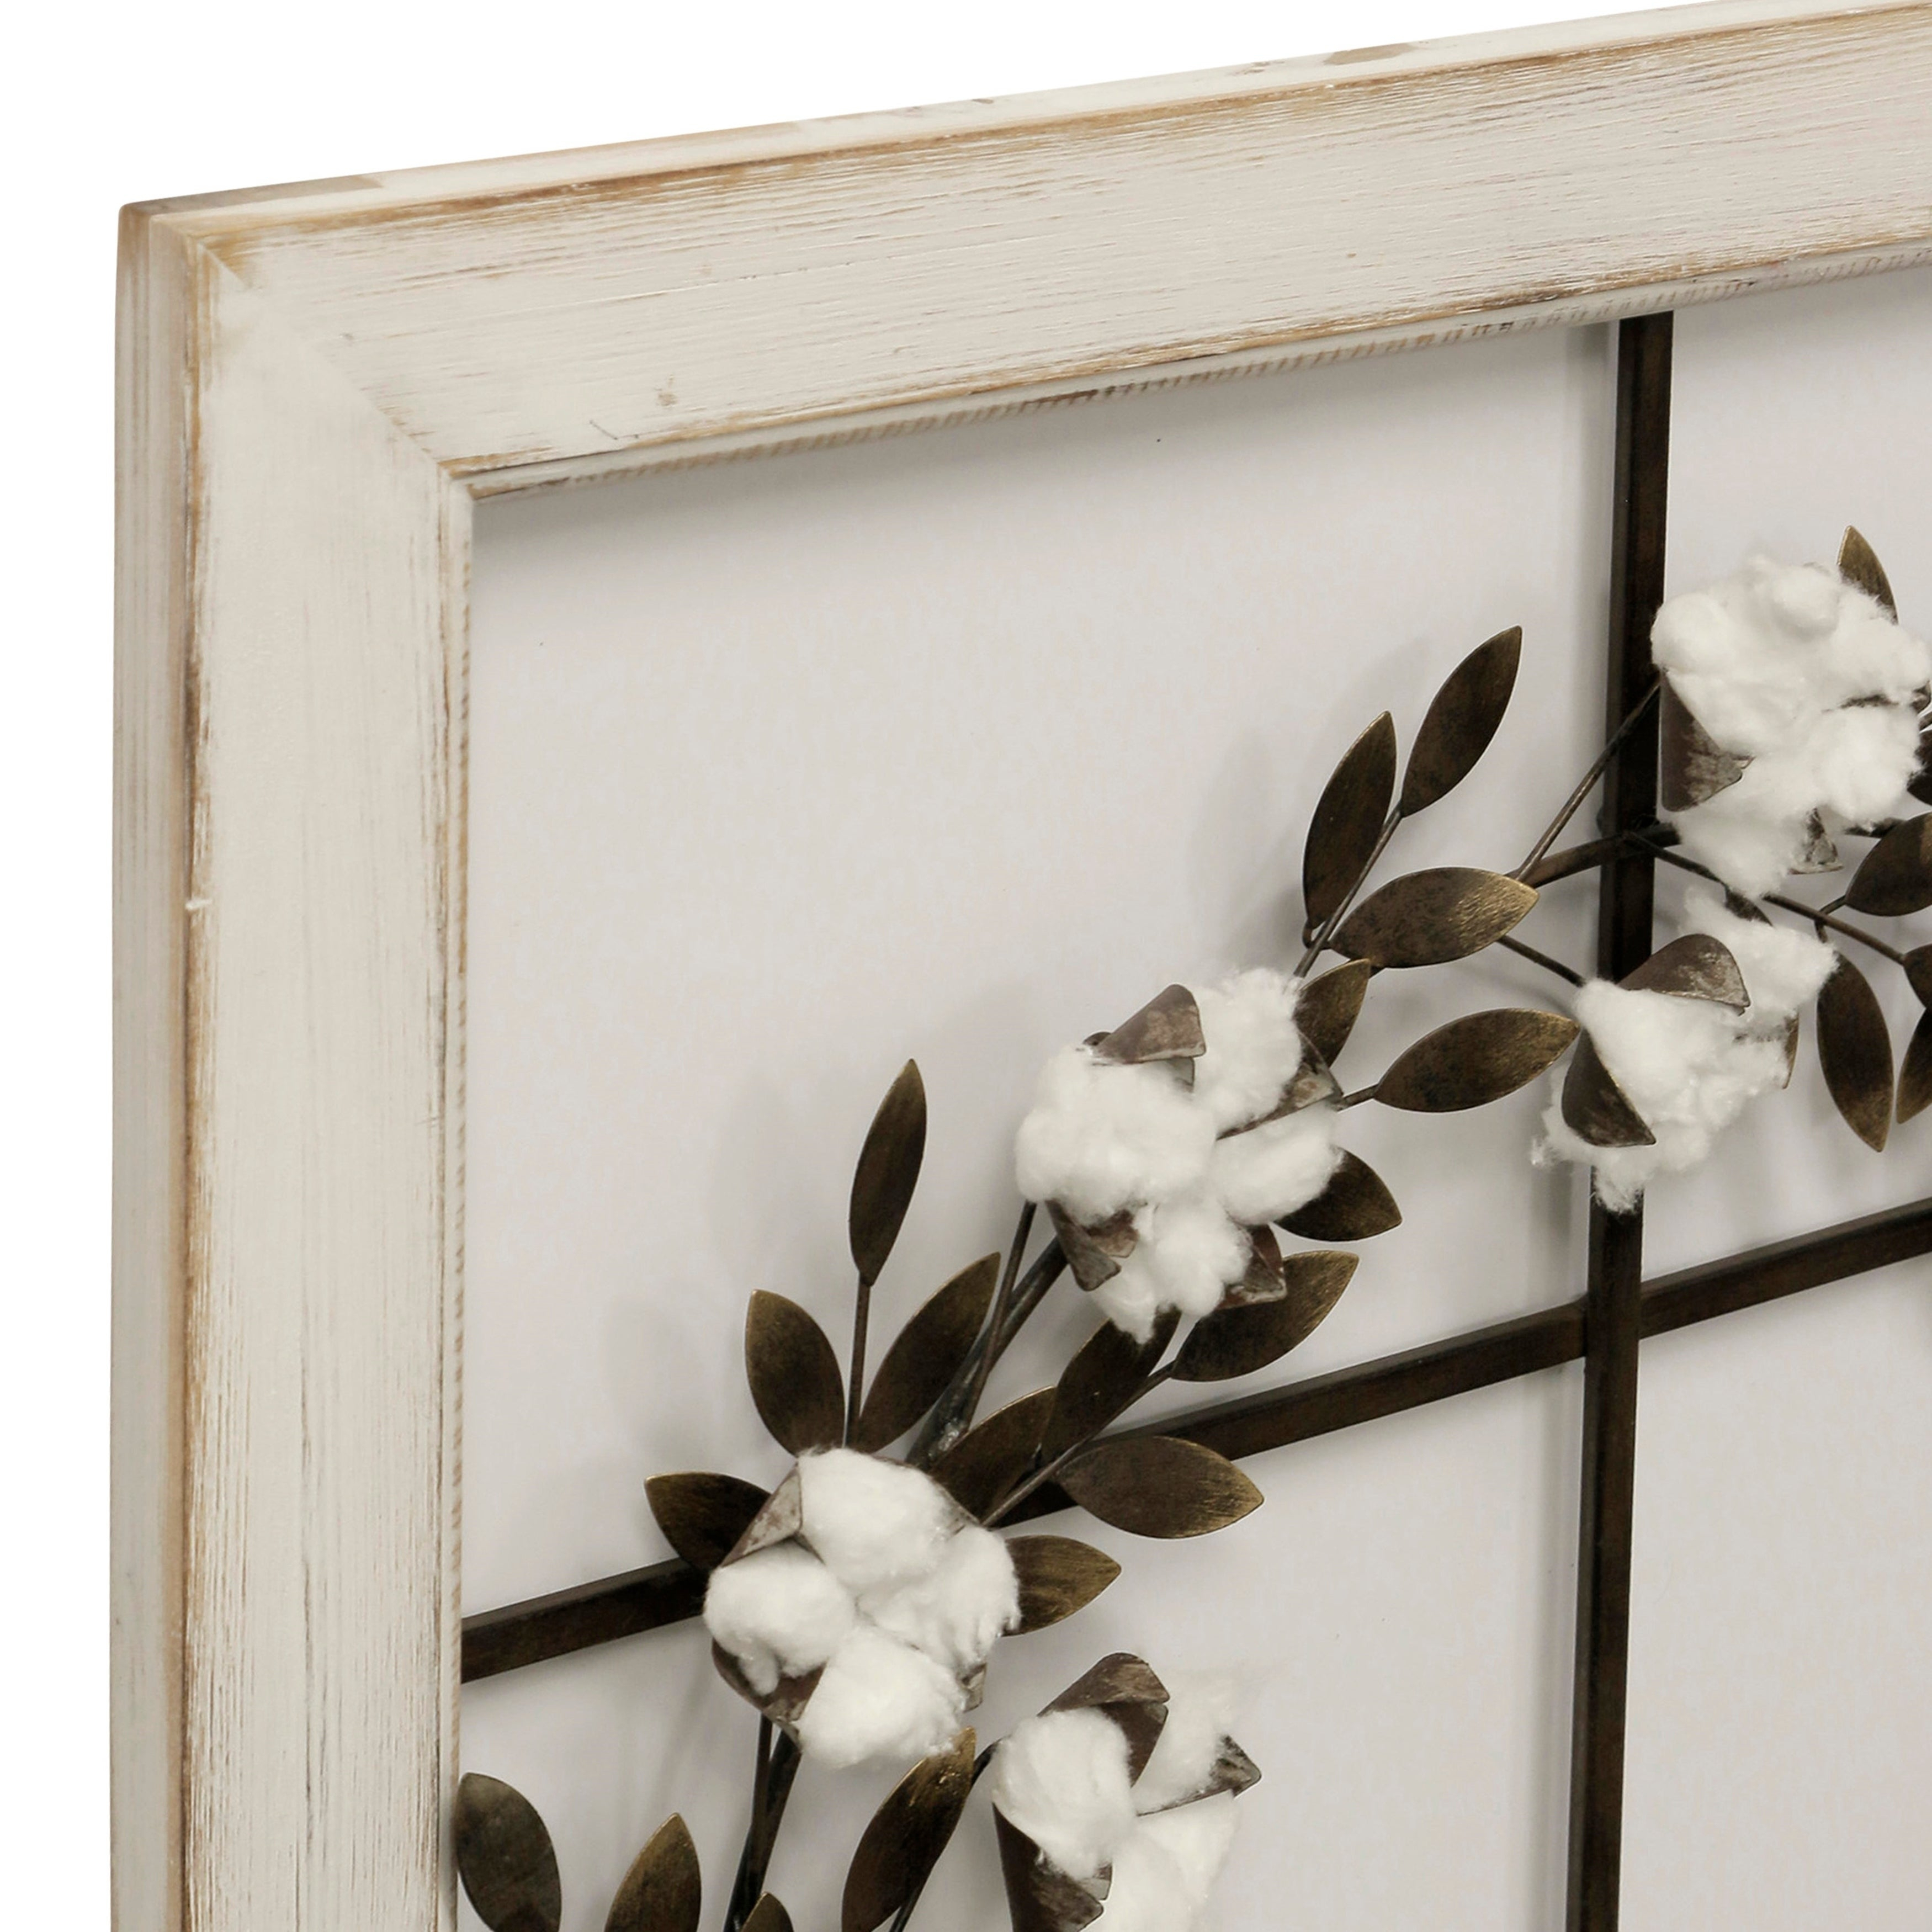 Floral Wreath Wood Framed Wall Art with regard to Floral Wreath Wood Framed Wall Decor (Image 15 of 30)